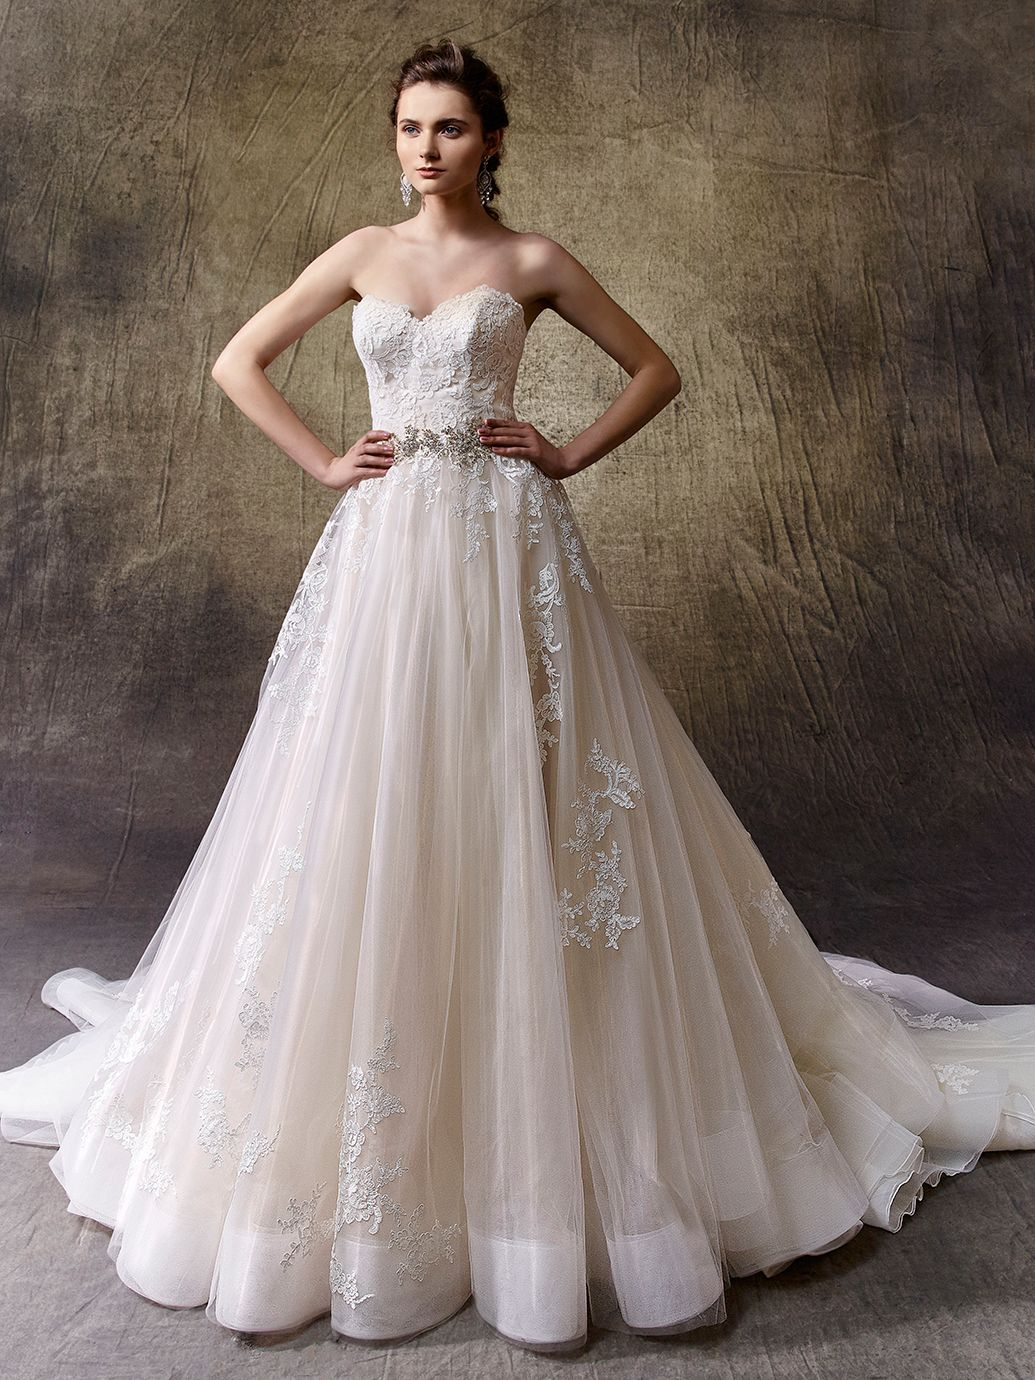 blue by enzoani jadorie find top designer wedding dresses bridal gowns at jaehee